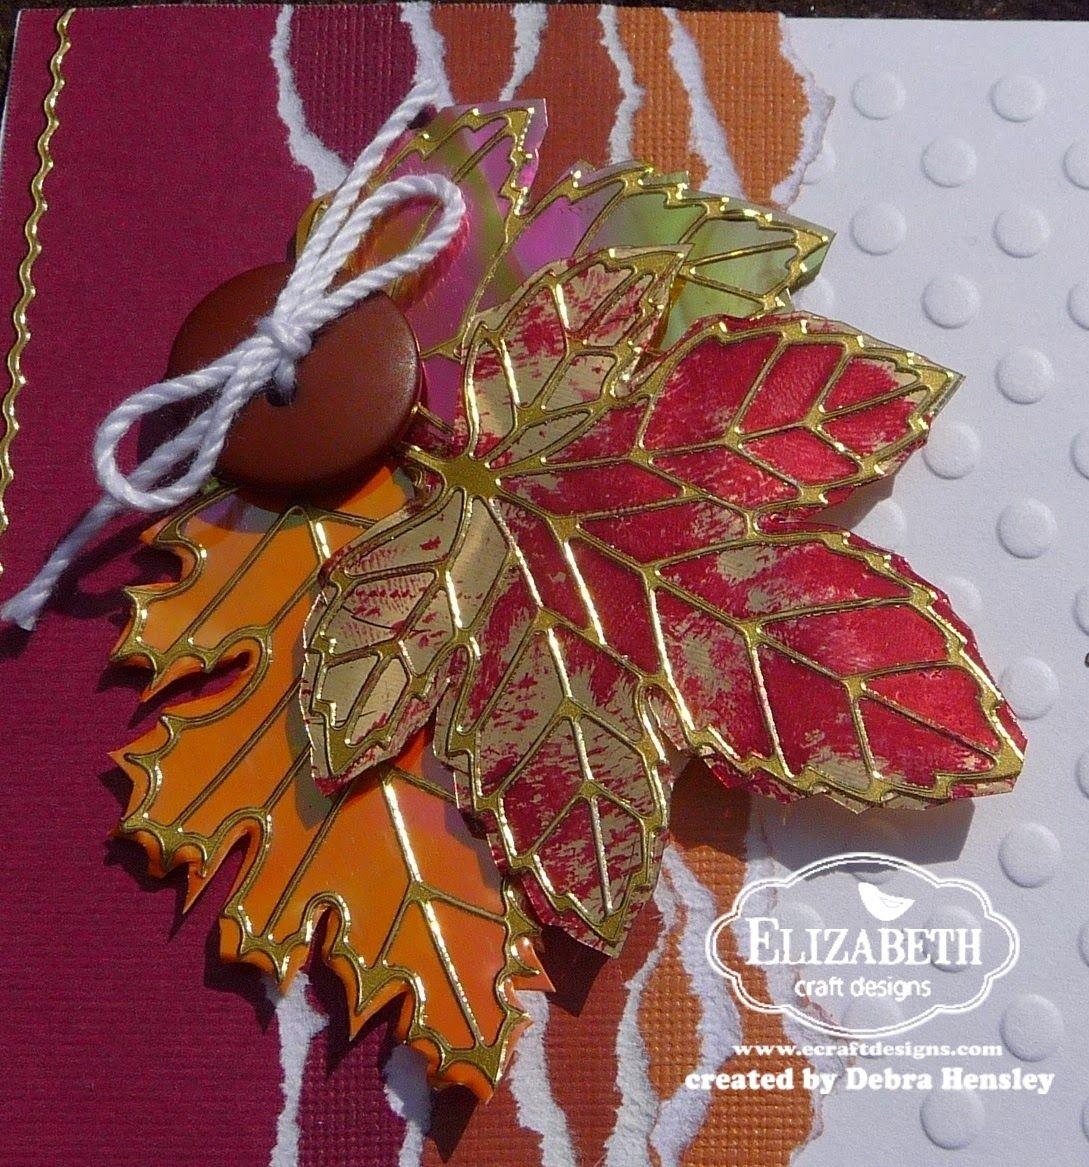 Minuet's Muse: Elizabeth Craft Designs- September Design Team Challenge -Fall, Harvest. Halloween